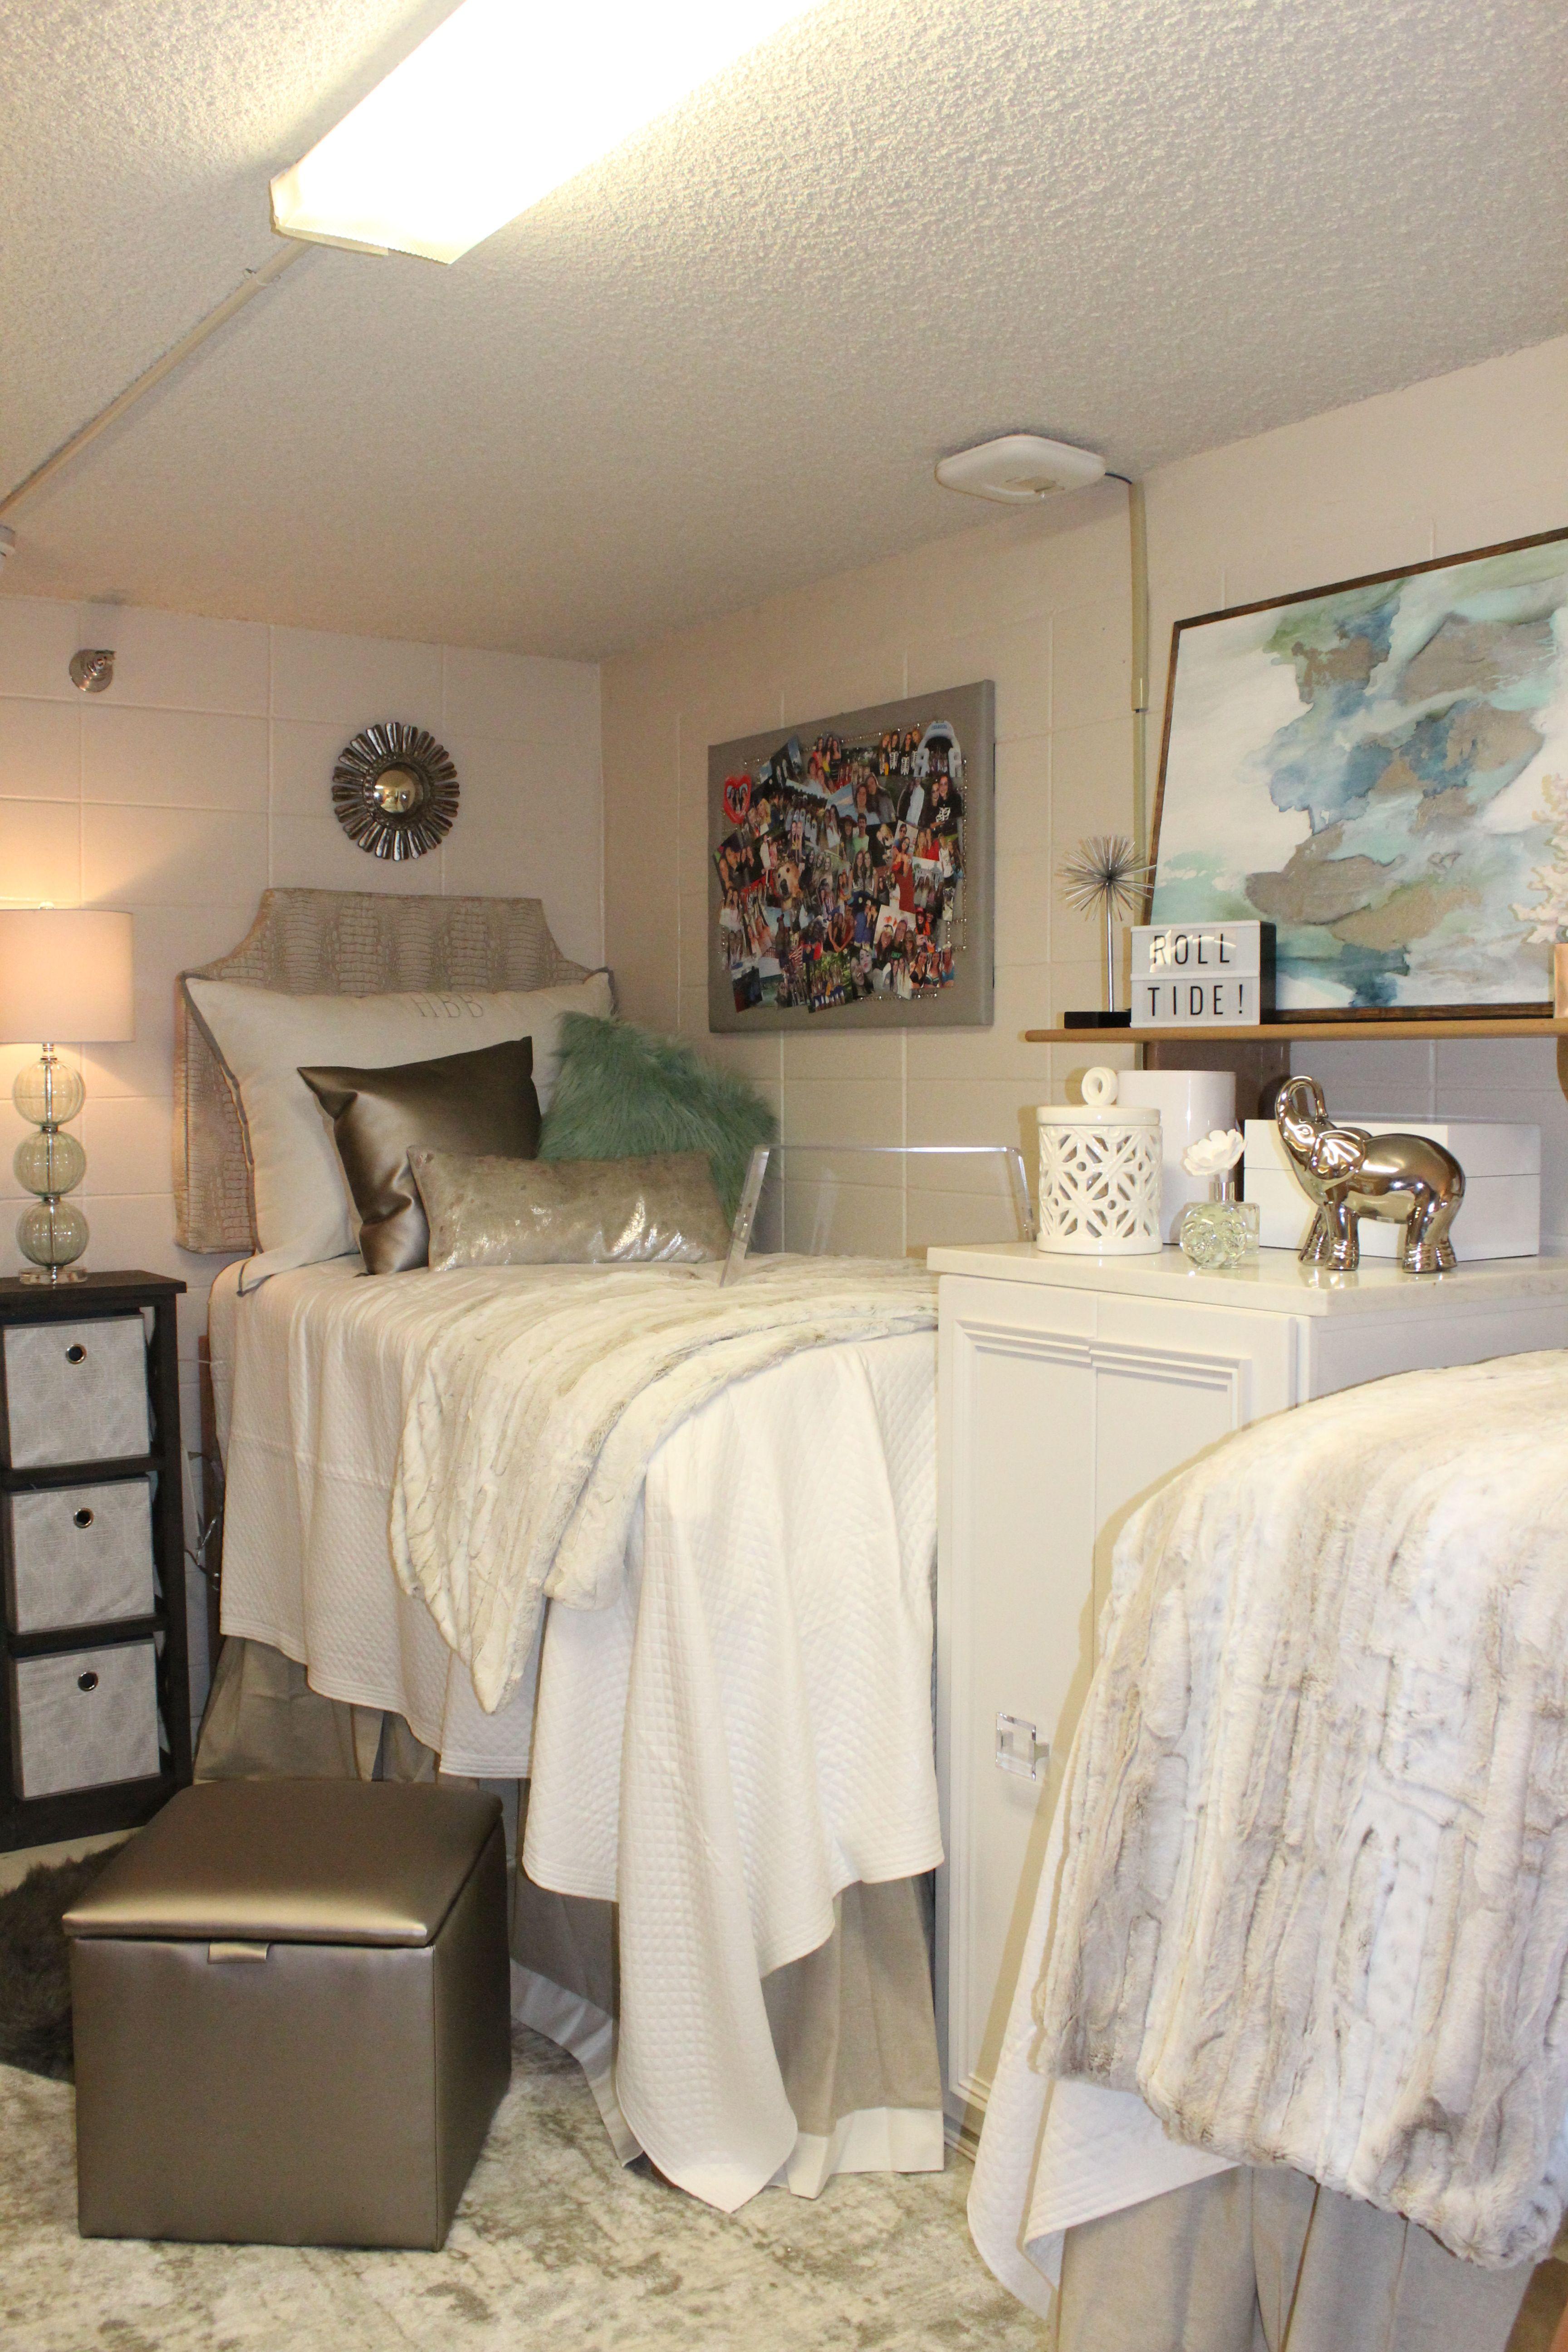 Alabama Tutwiler Dorm Ansley Room Ideas In 2019 Preppy